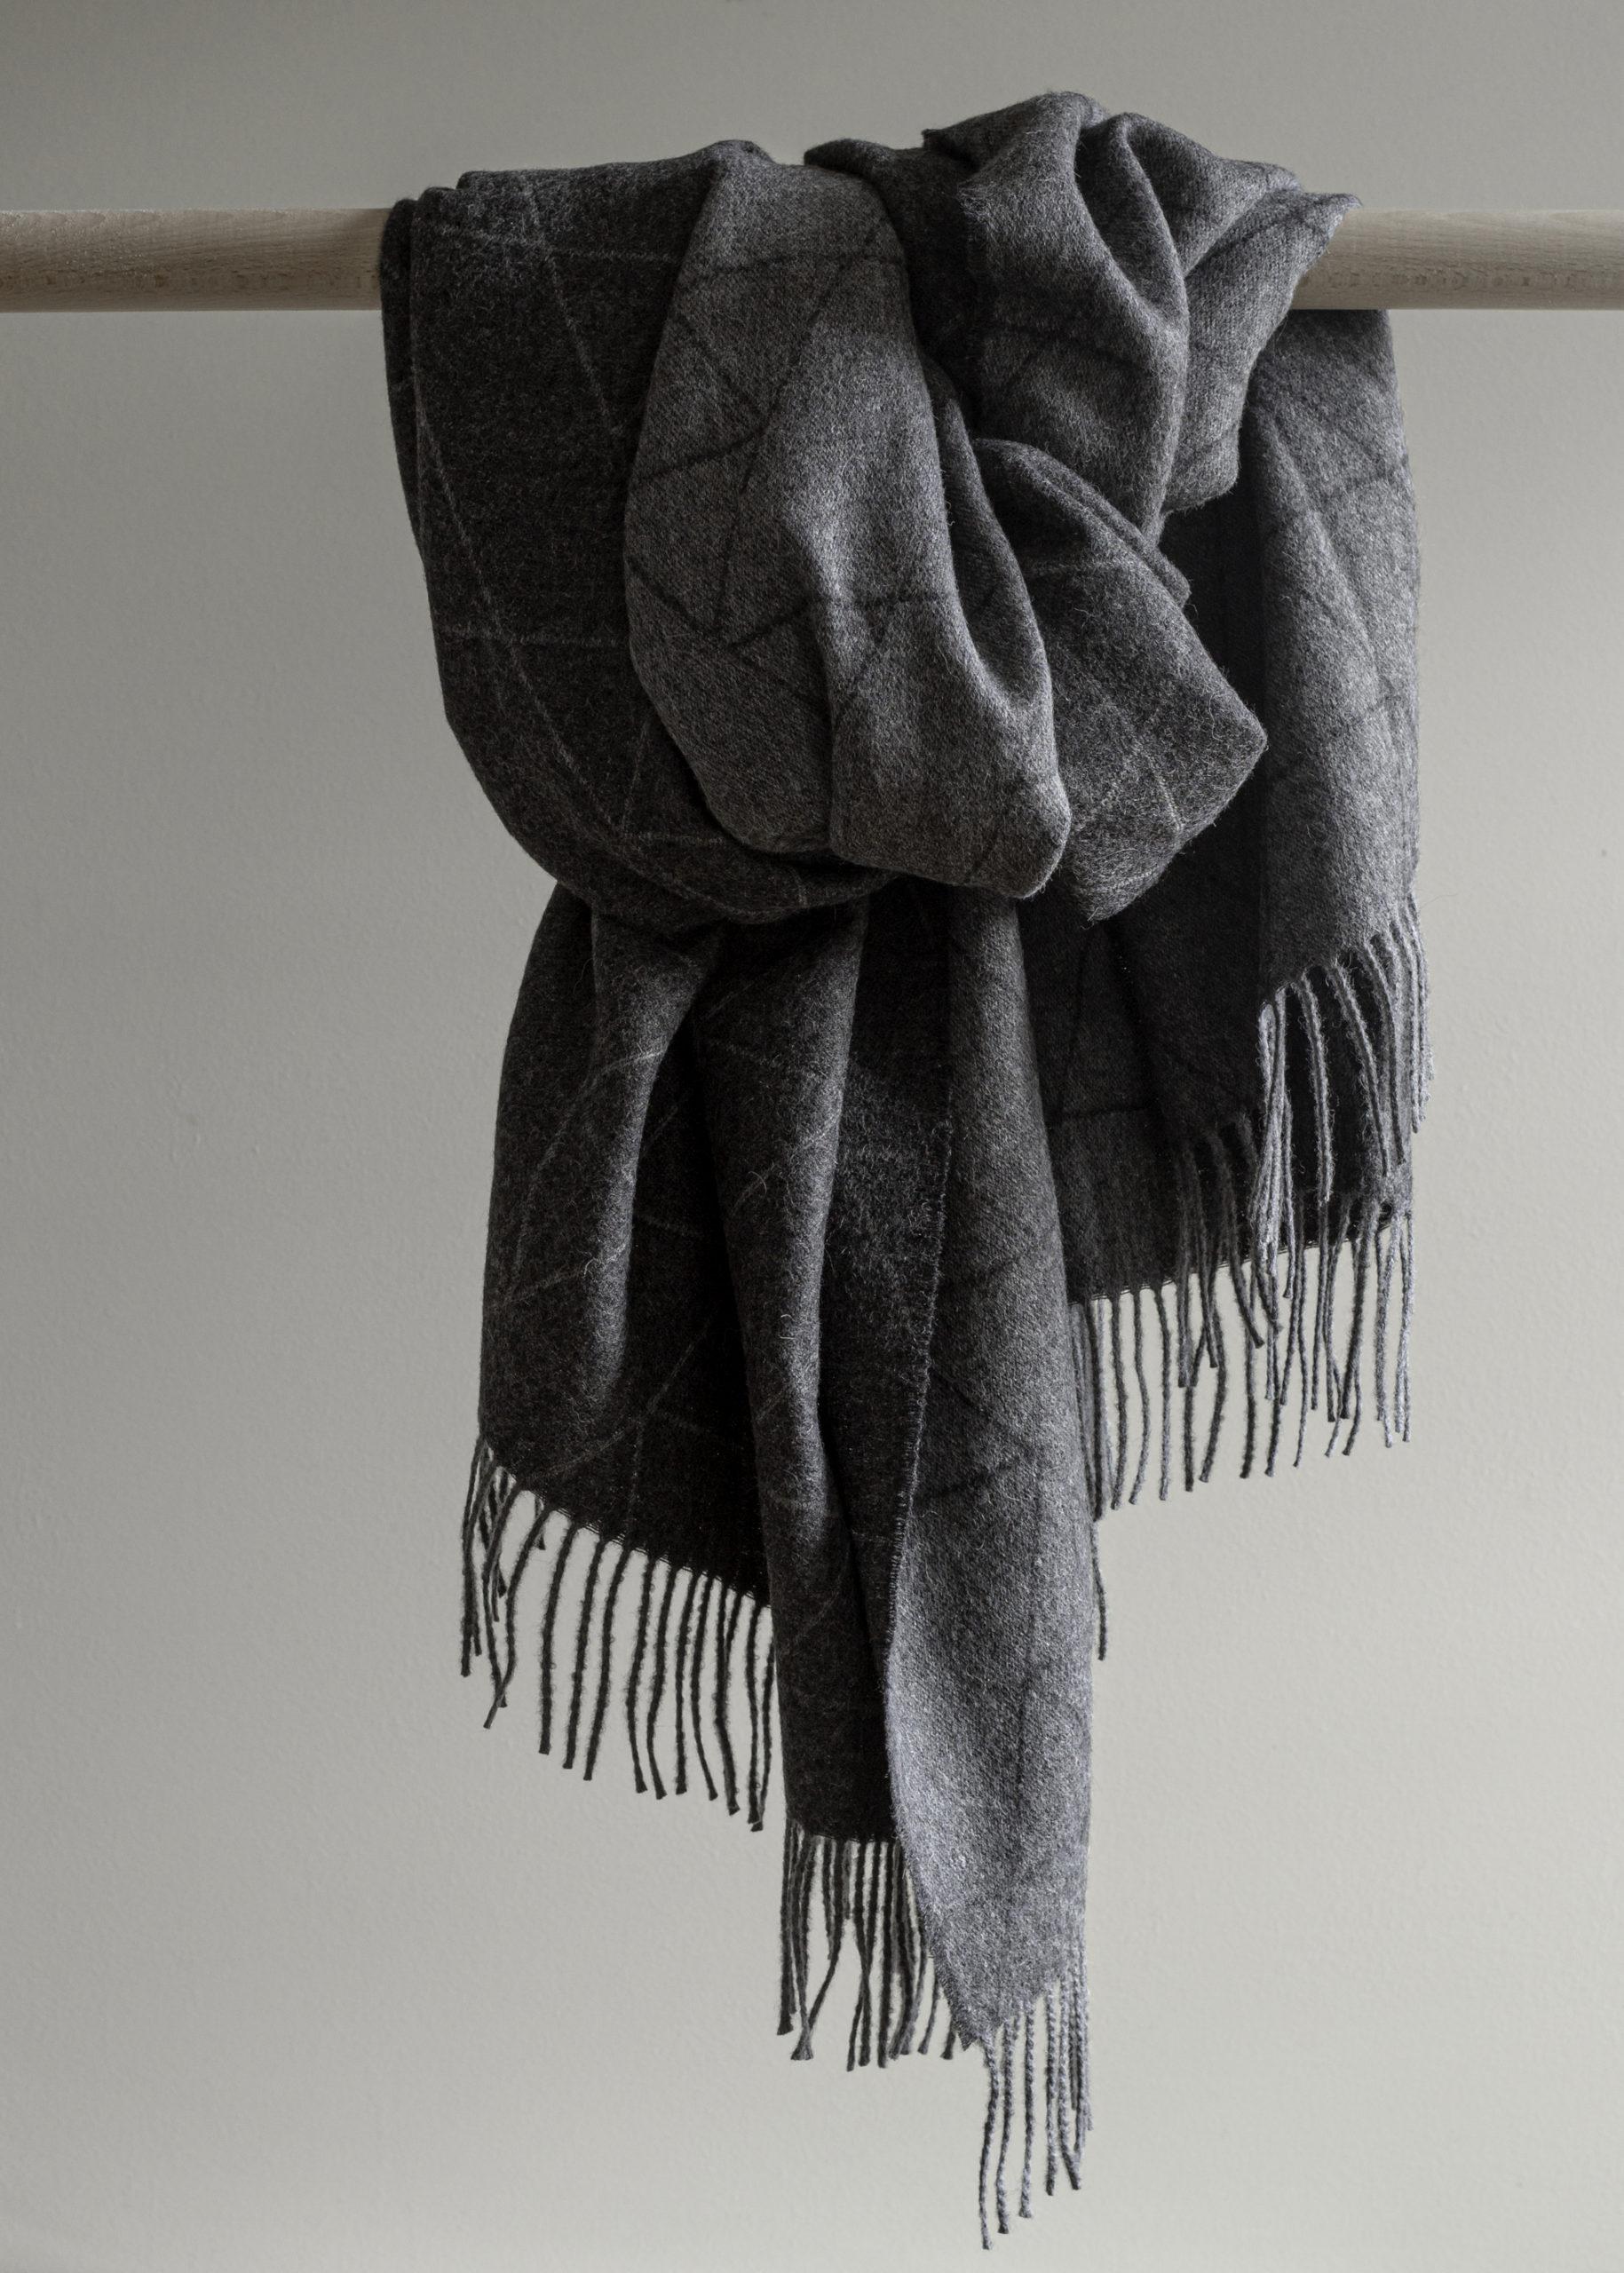 Architectmade-FJ-Pattern-Throw-Baby-Alpaca-Wool-Denmark-Finn-Juhl-4